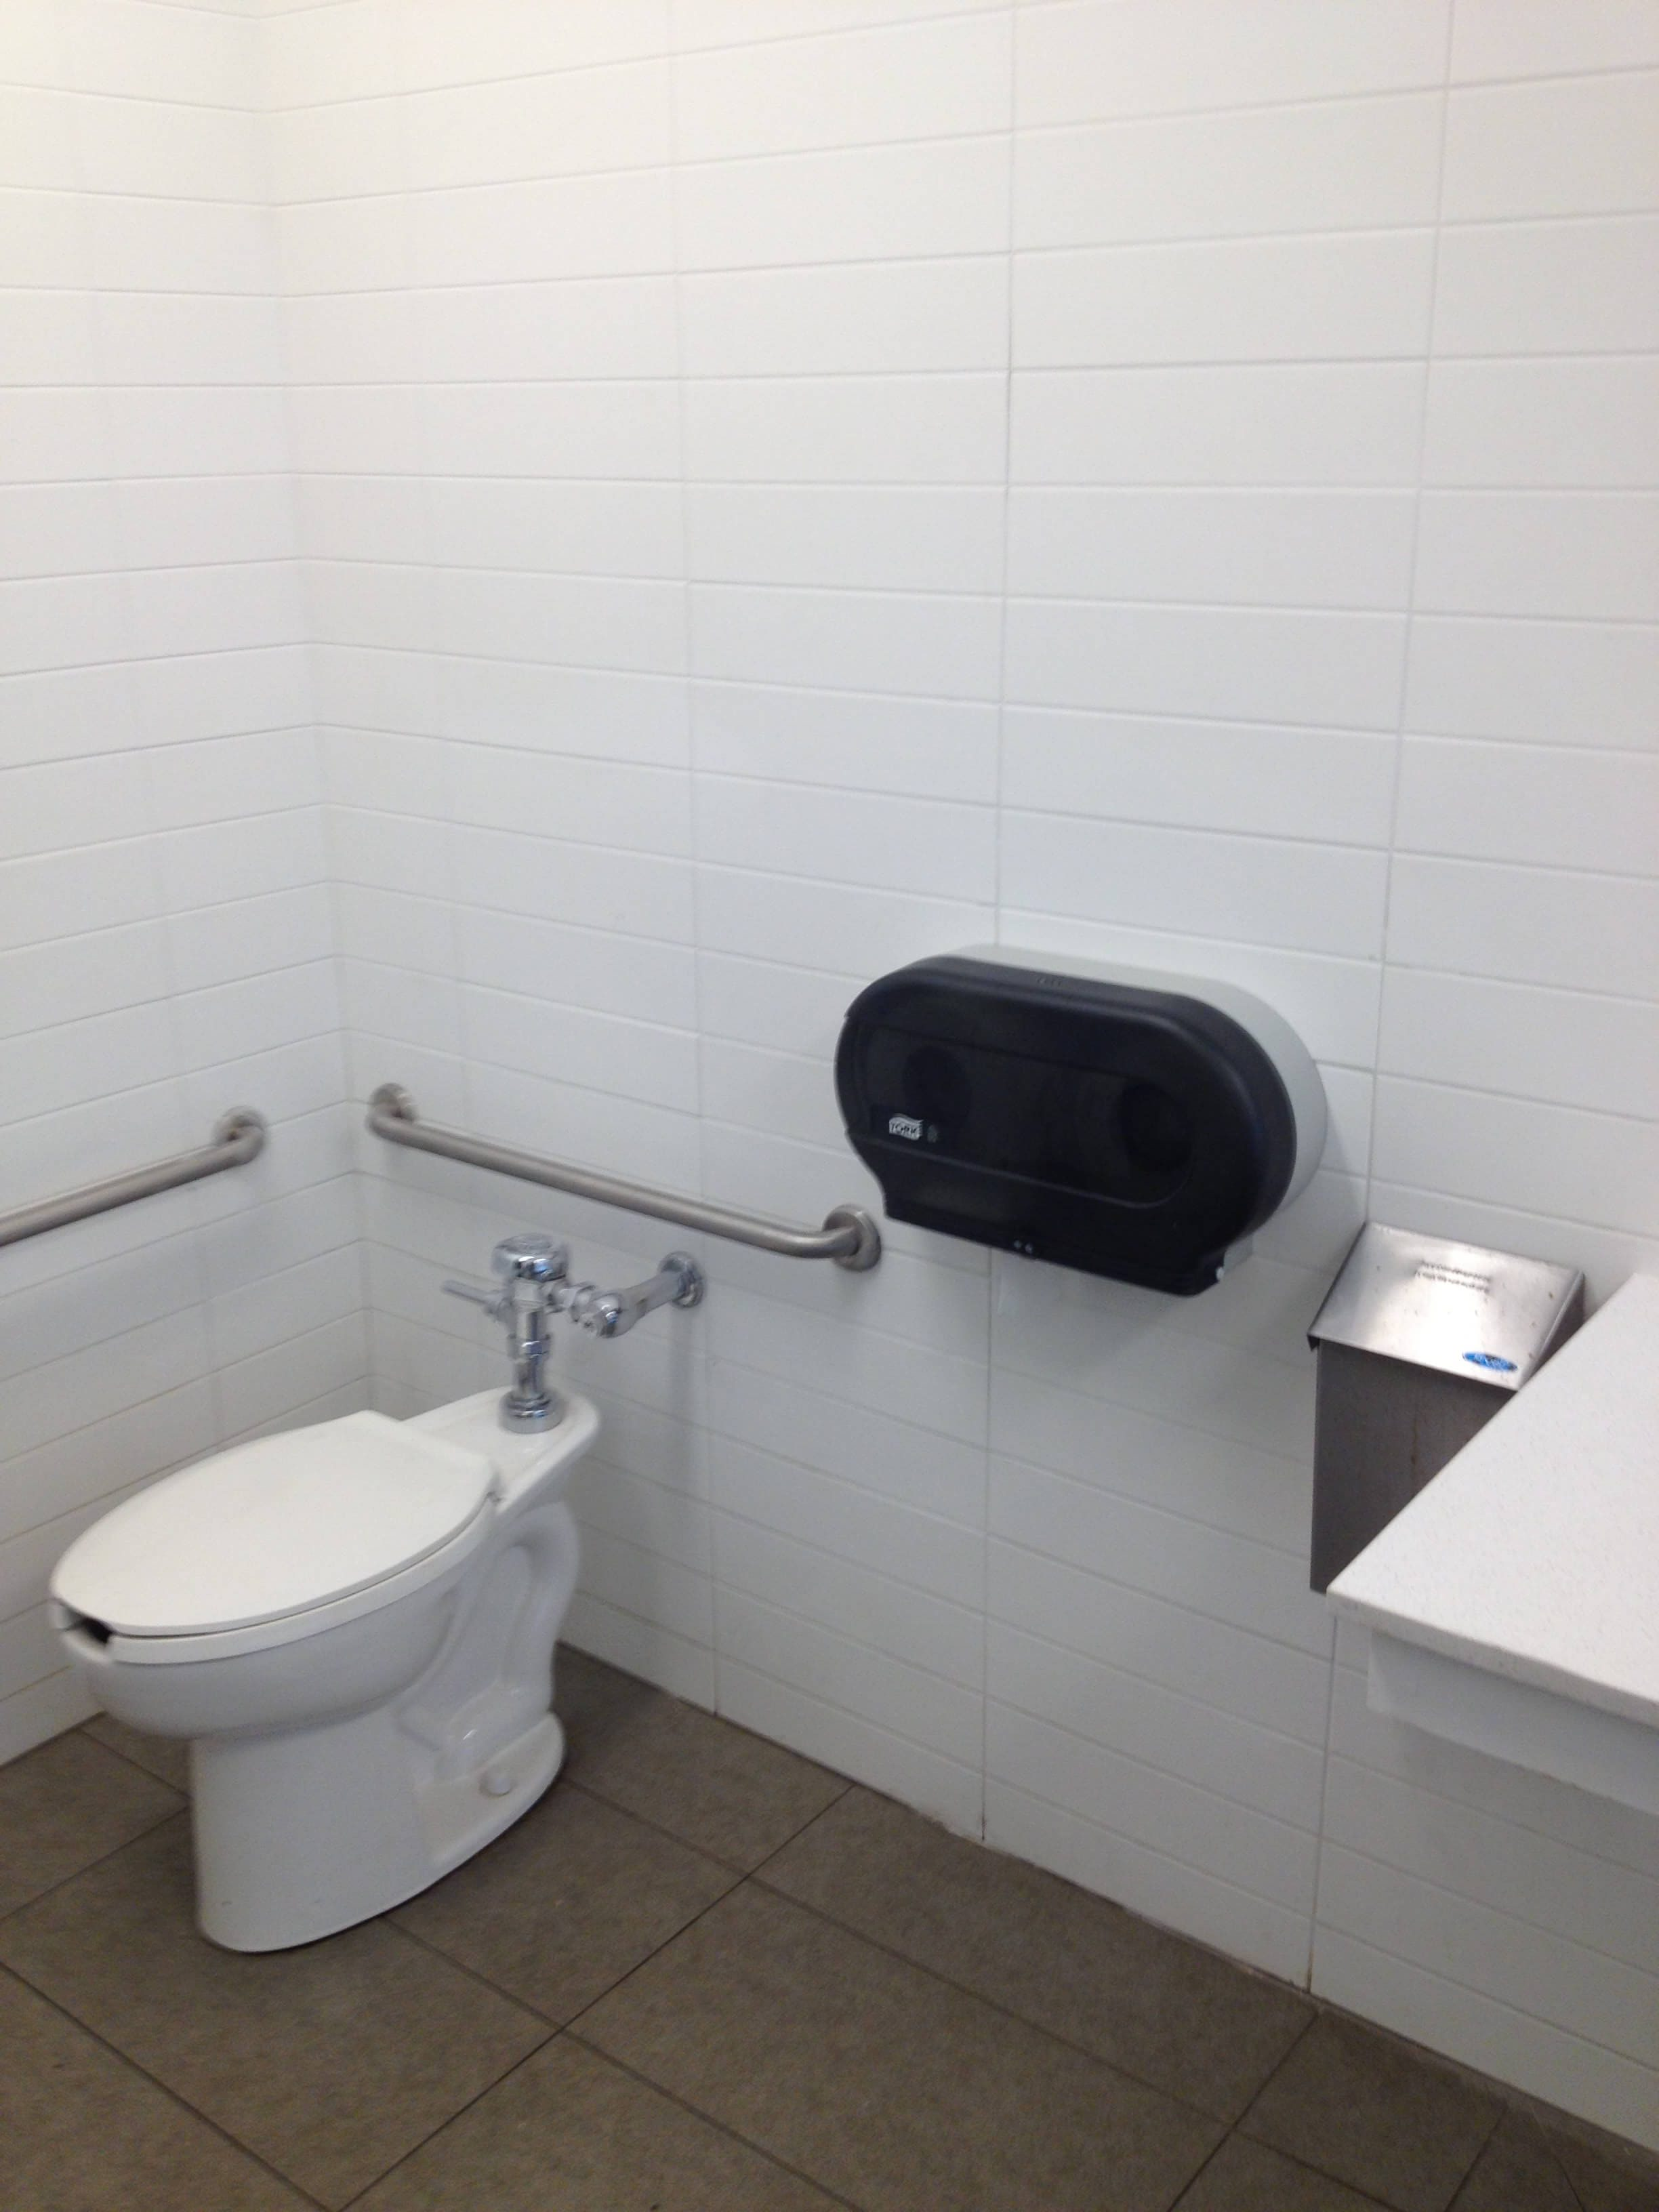 Concession Buildings / Washroom